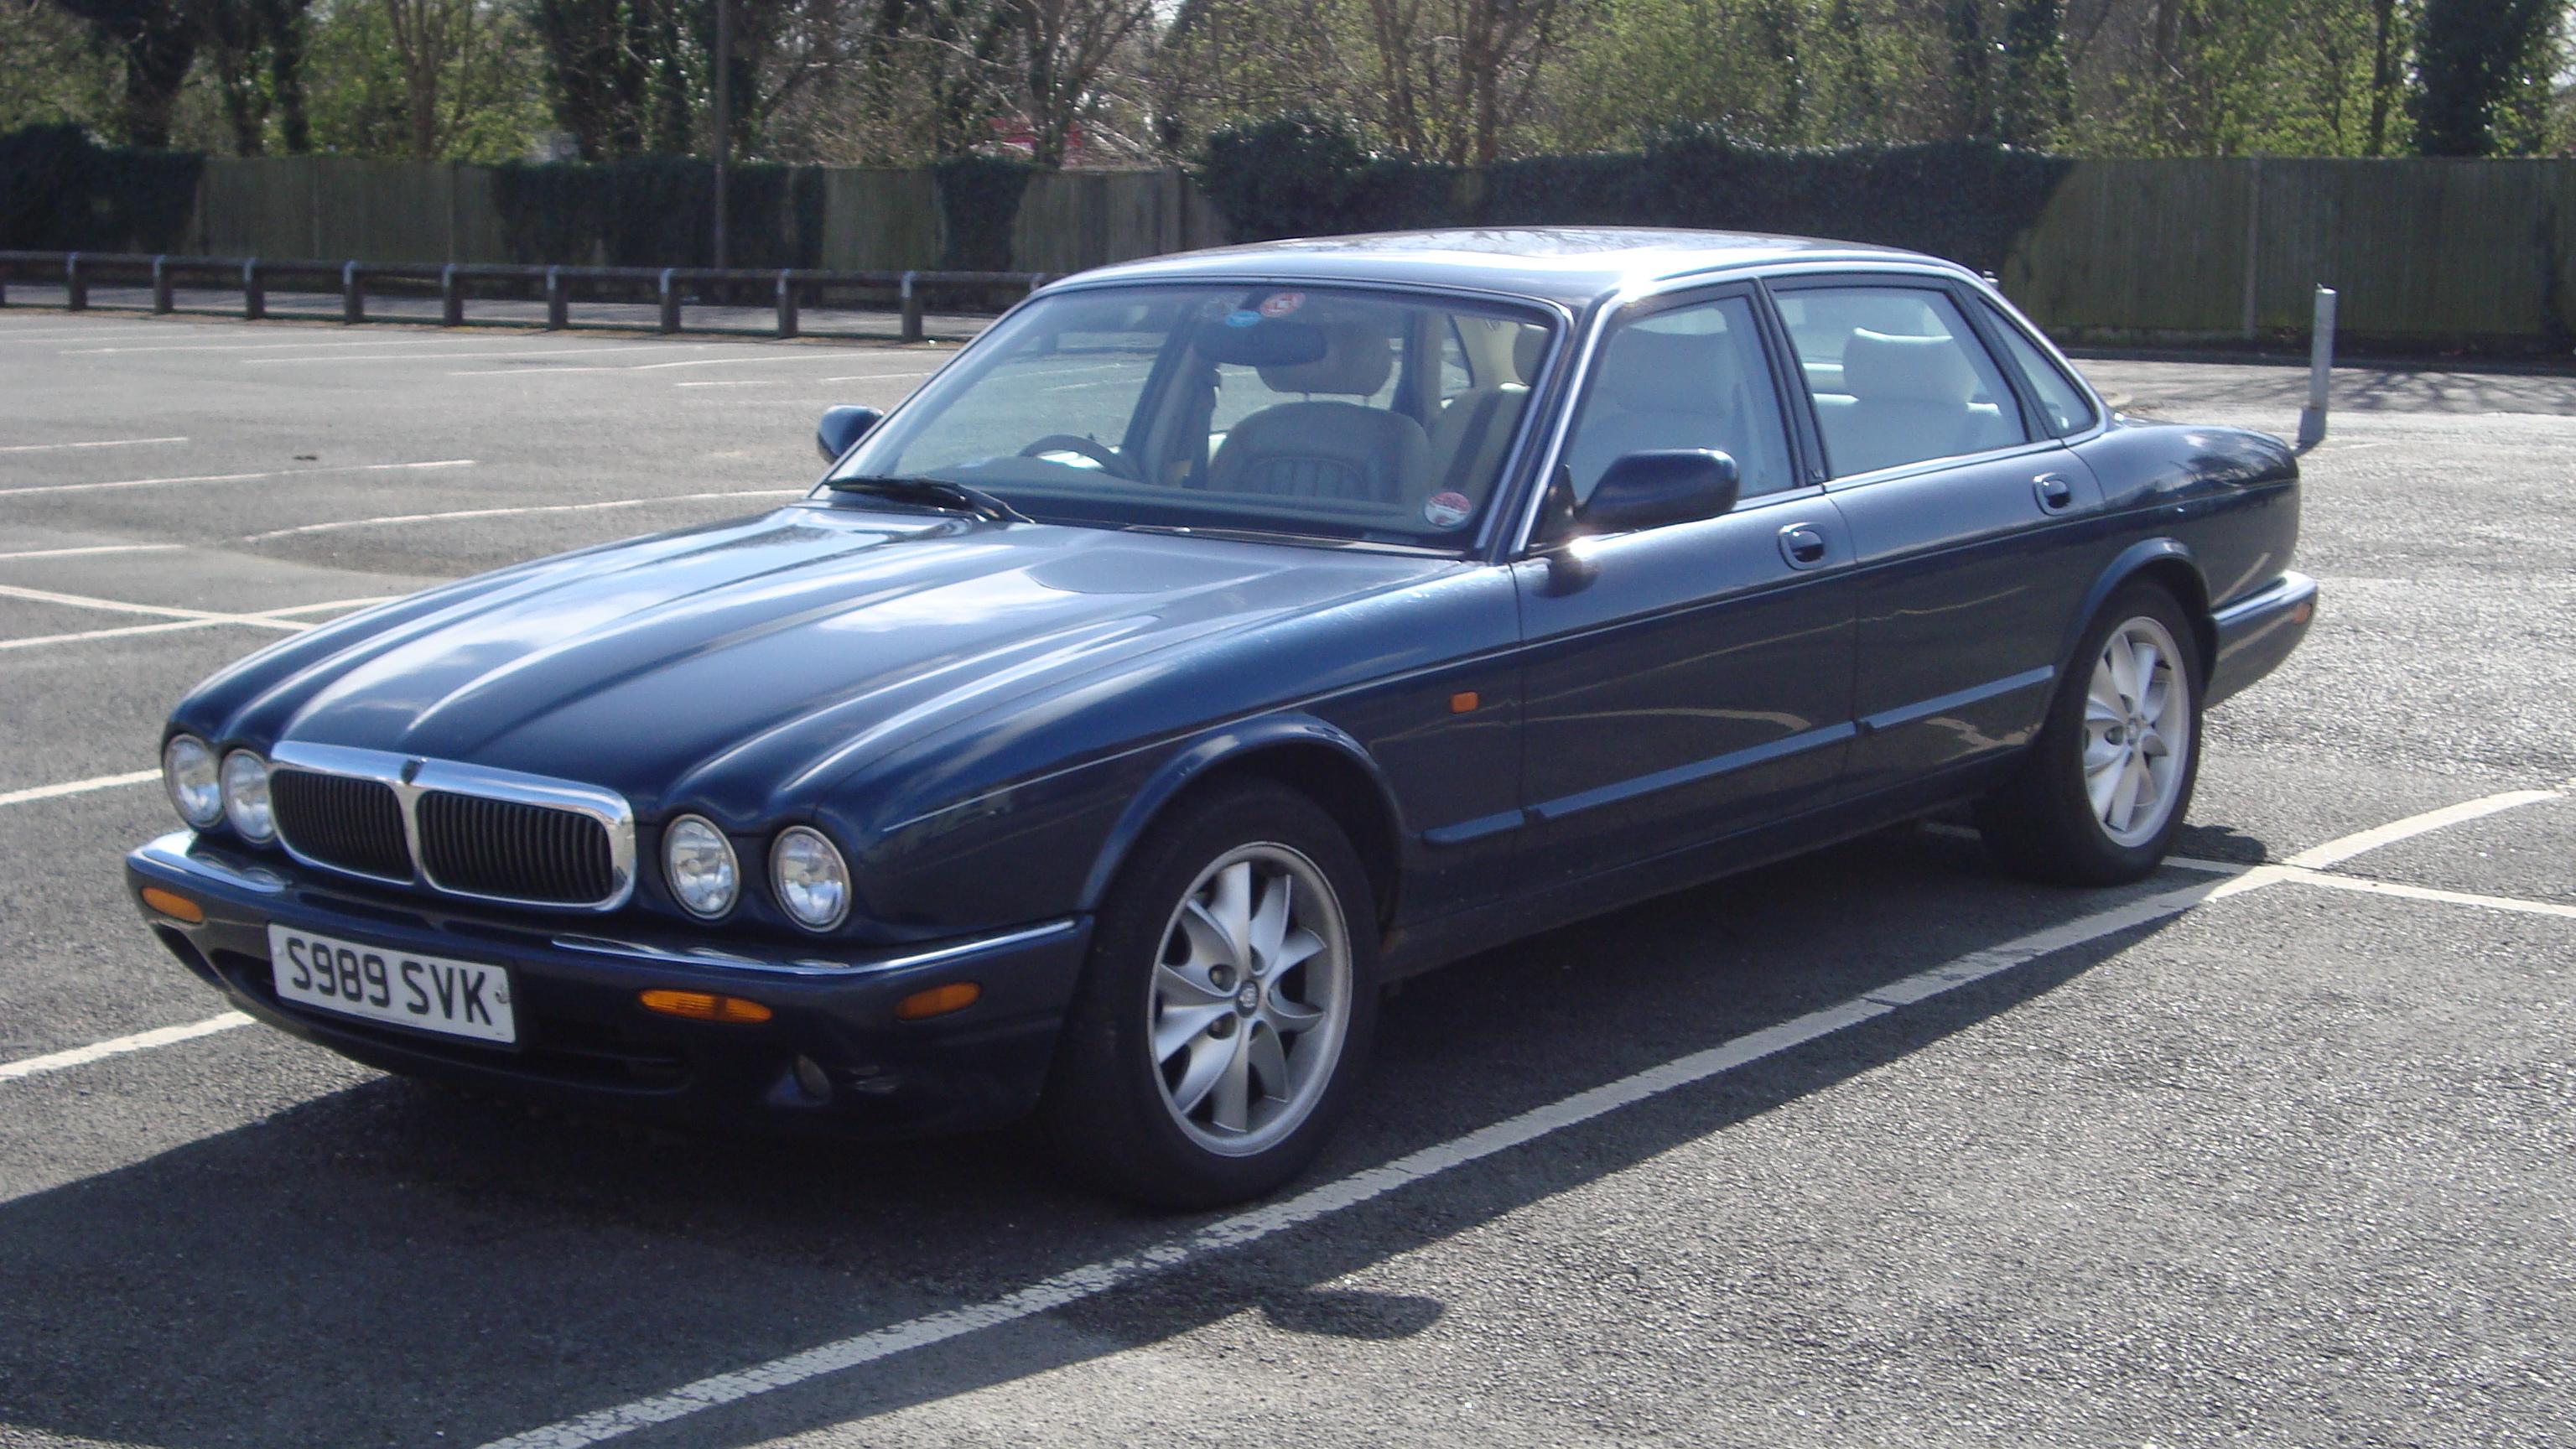 Amazing File:1998 Jaguar XJ8 4.0 (13307796565)